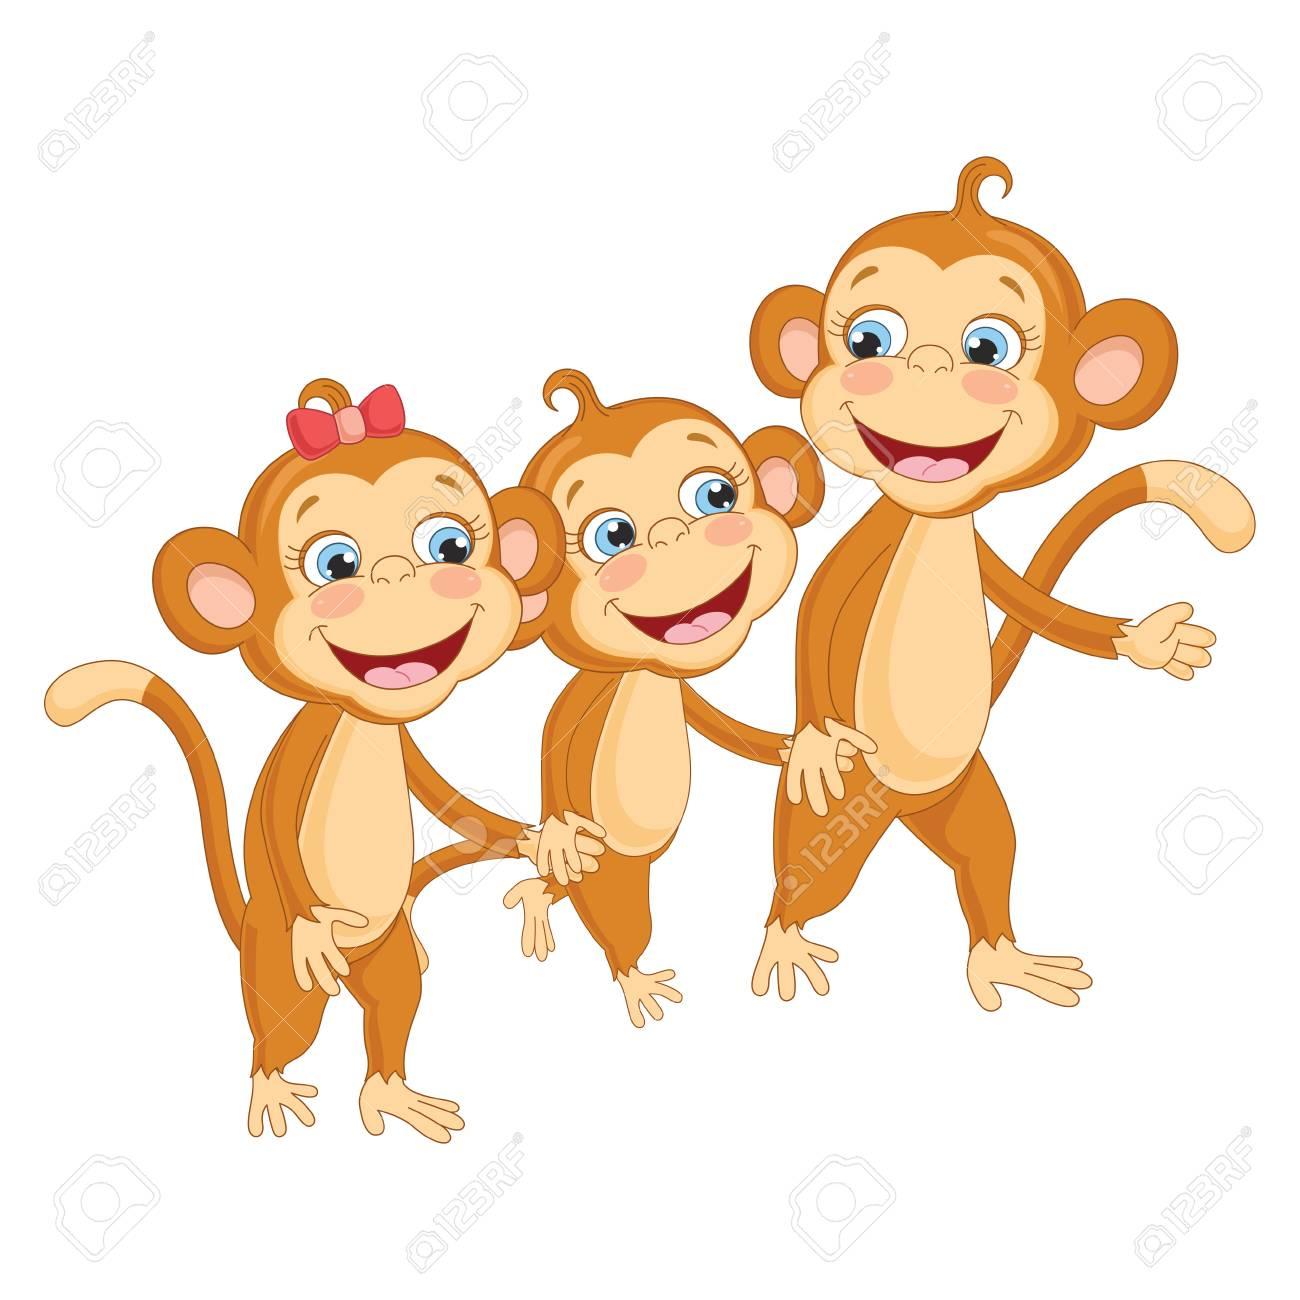 Vector Illustration Of Cartoon Monkeys Royalty Free Cliparts Vectors And Stock Illustration Image 103194844